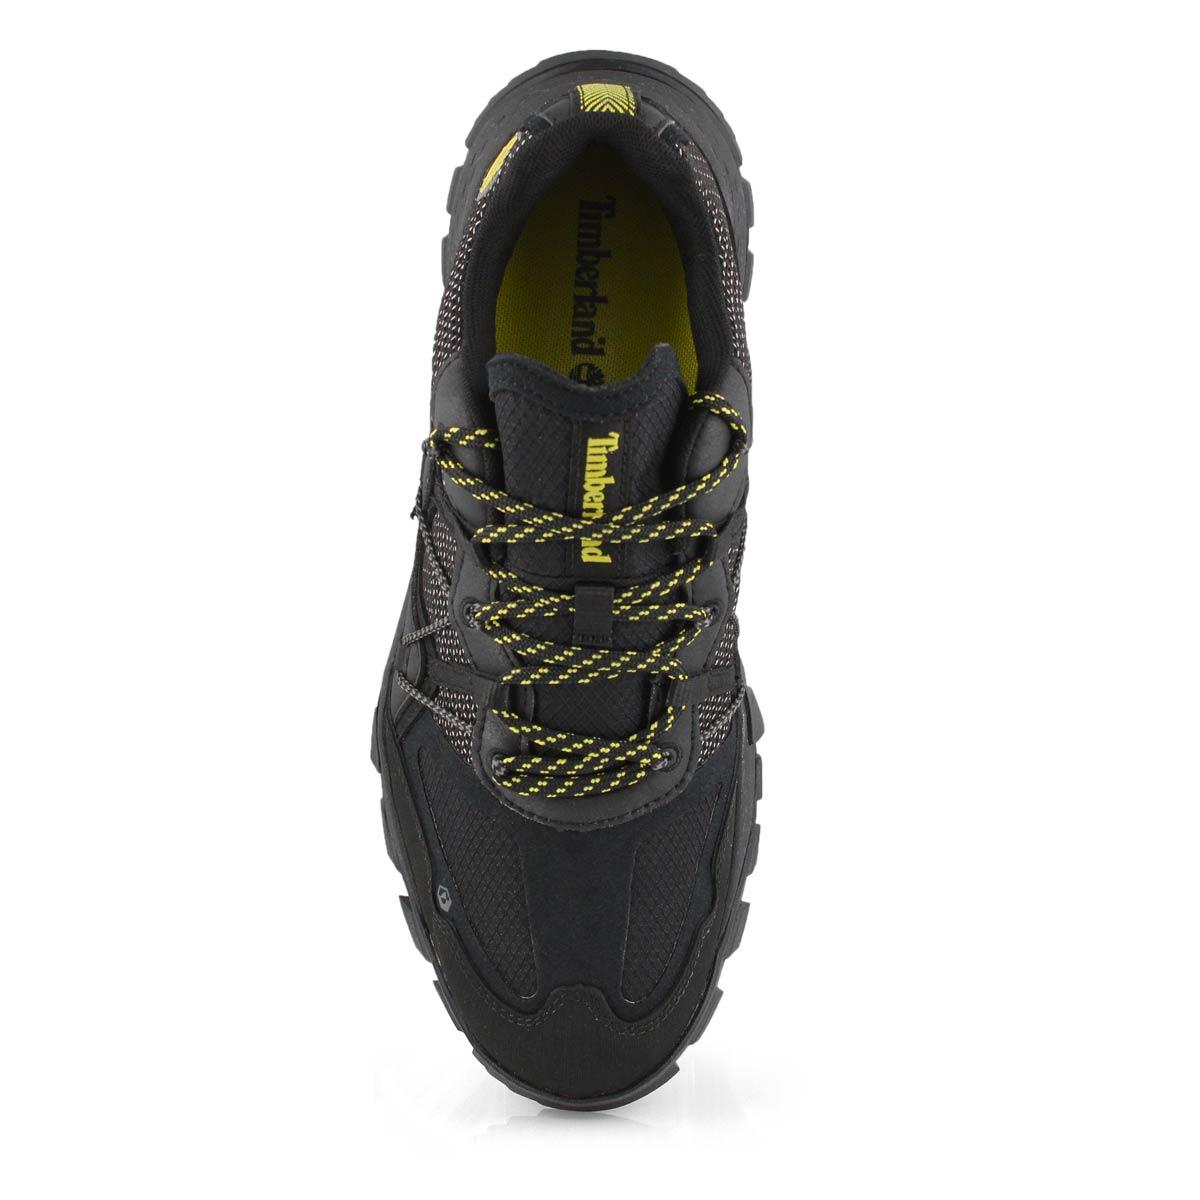 Men's GARRISON TRAIL black hiking shoes